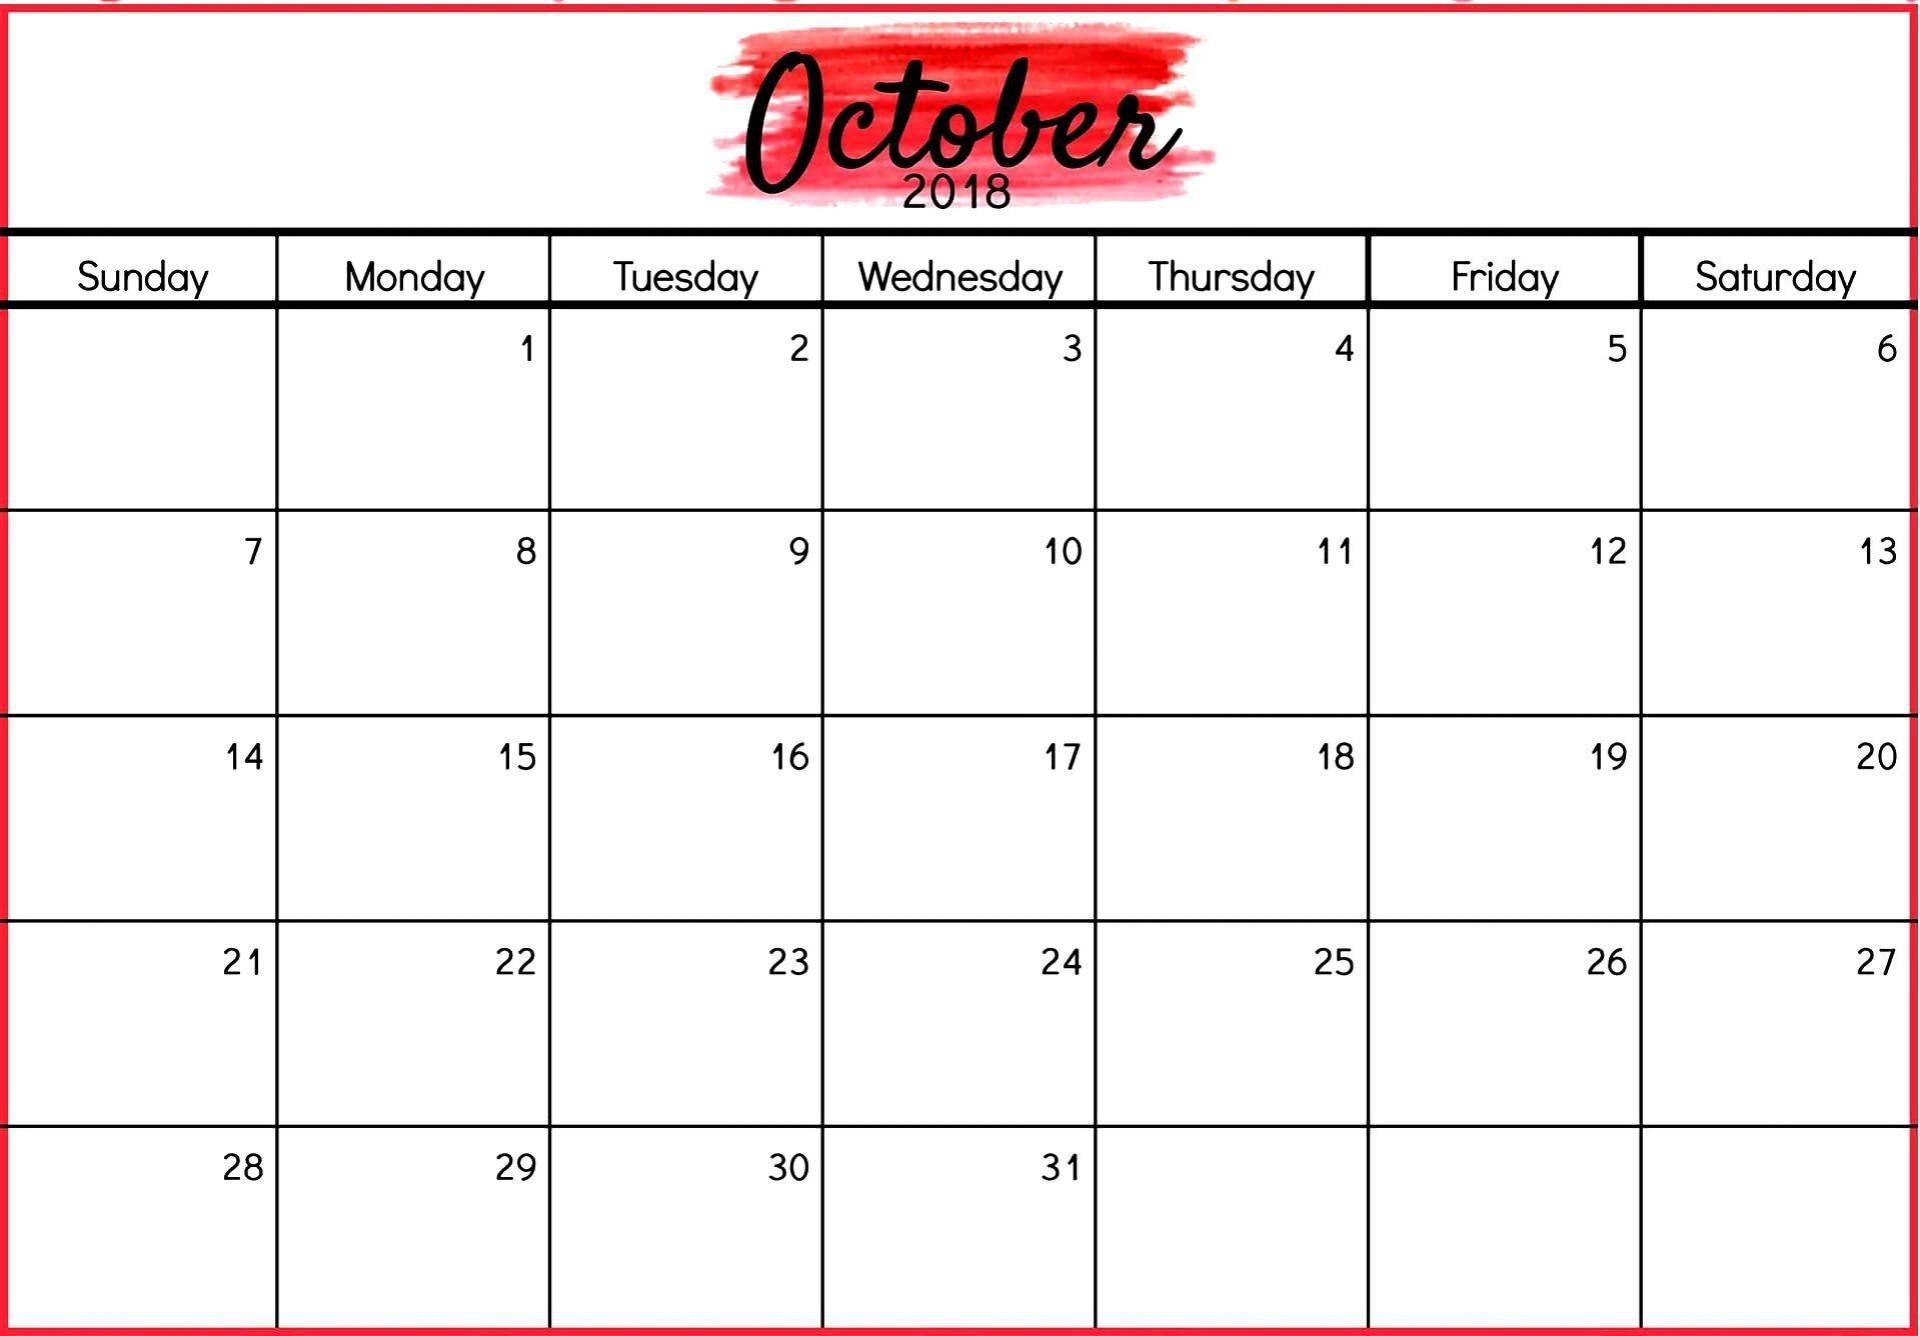 002 Fantastic Calendar Template October 2018 Word High Resolution 1920